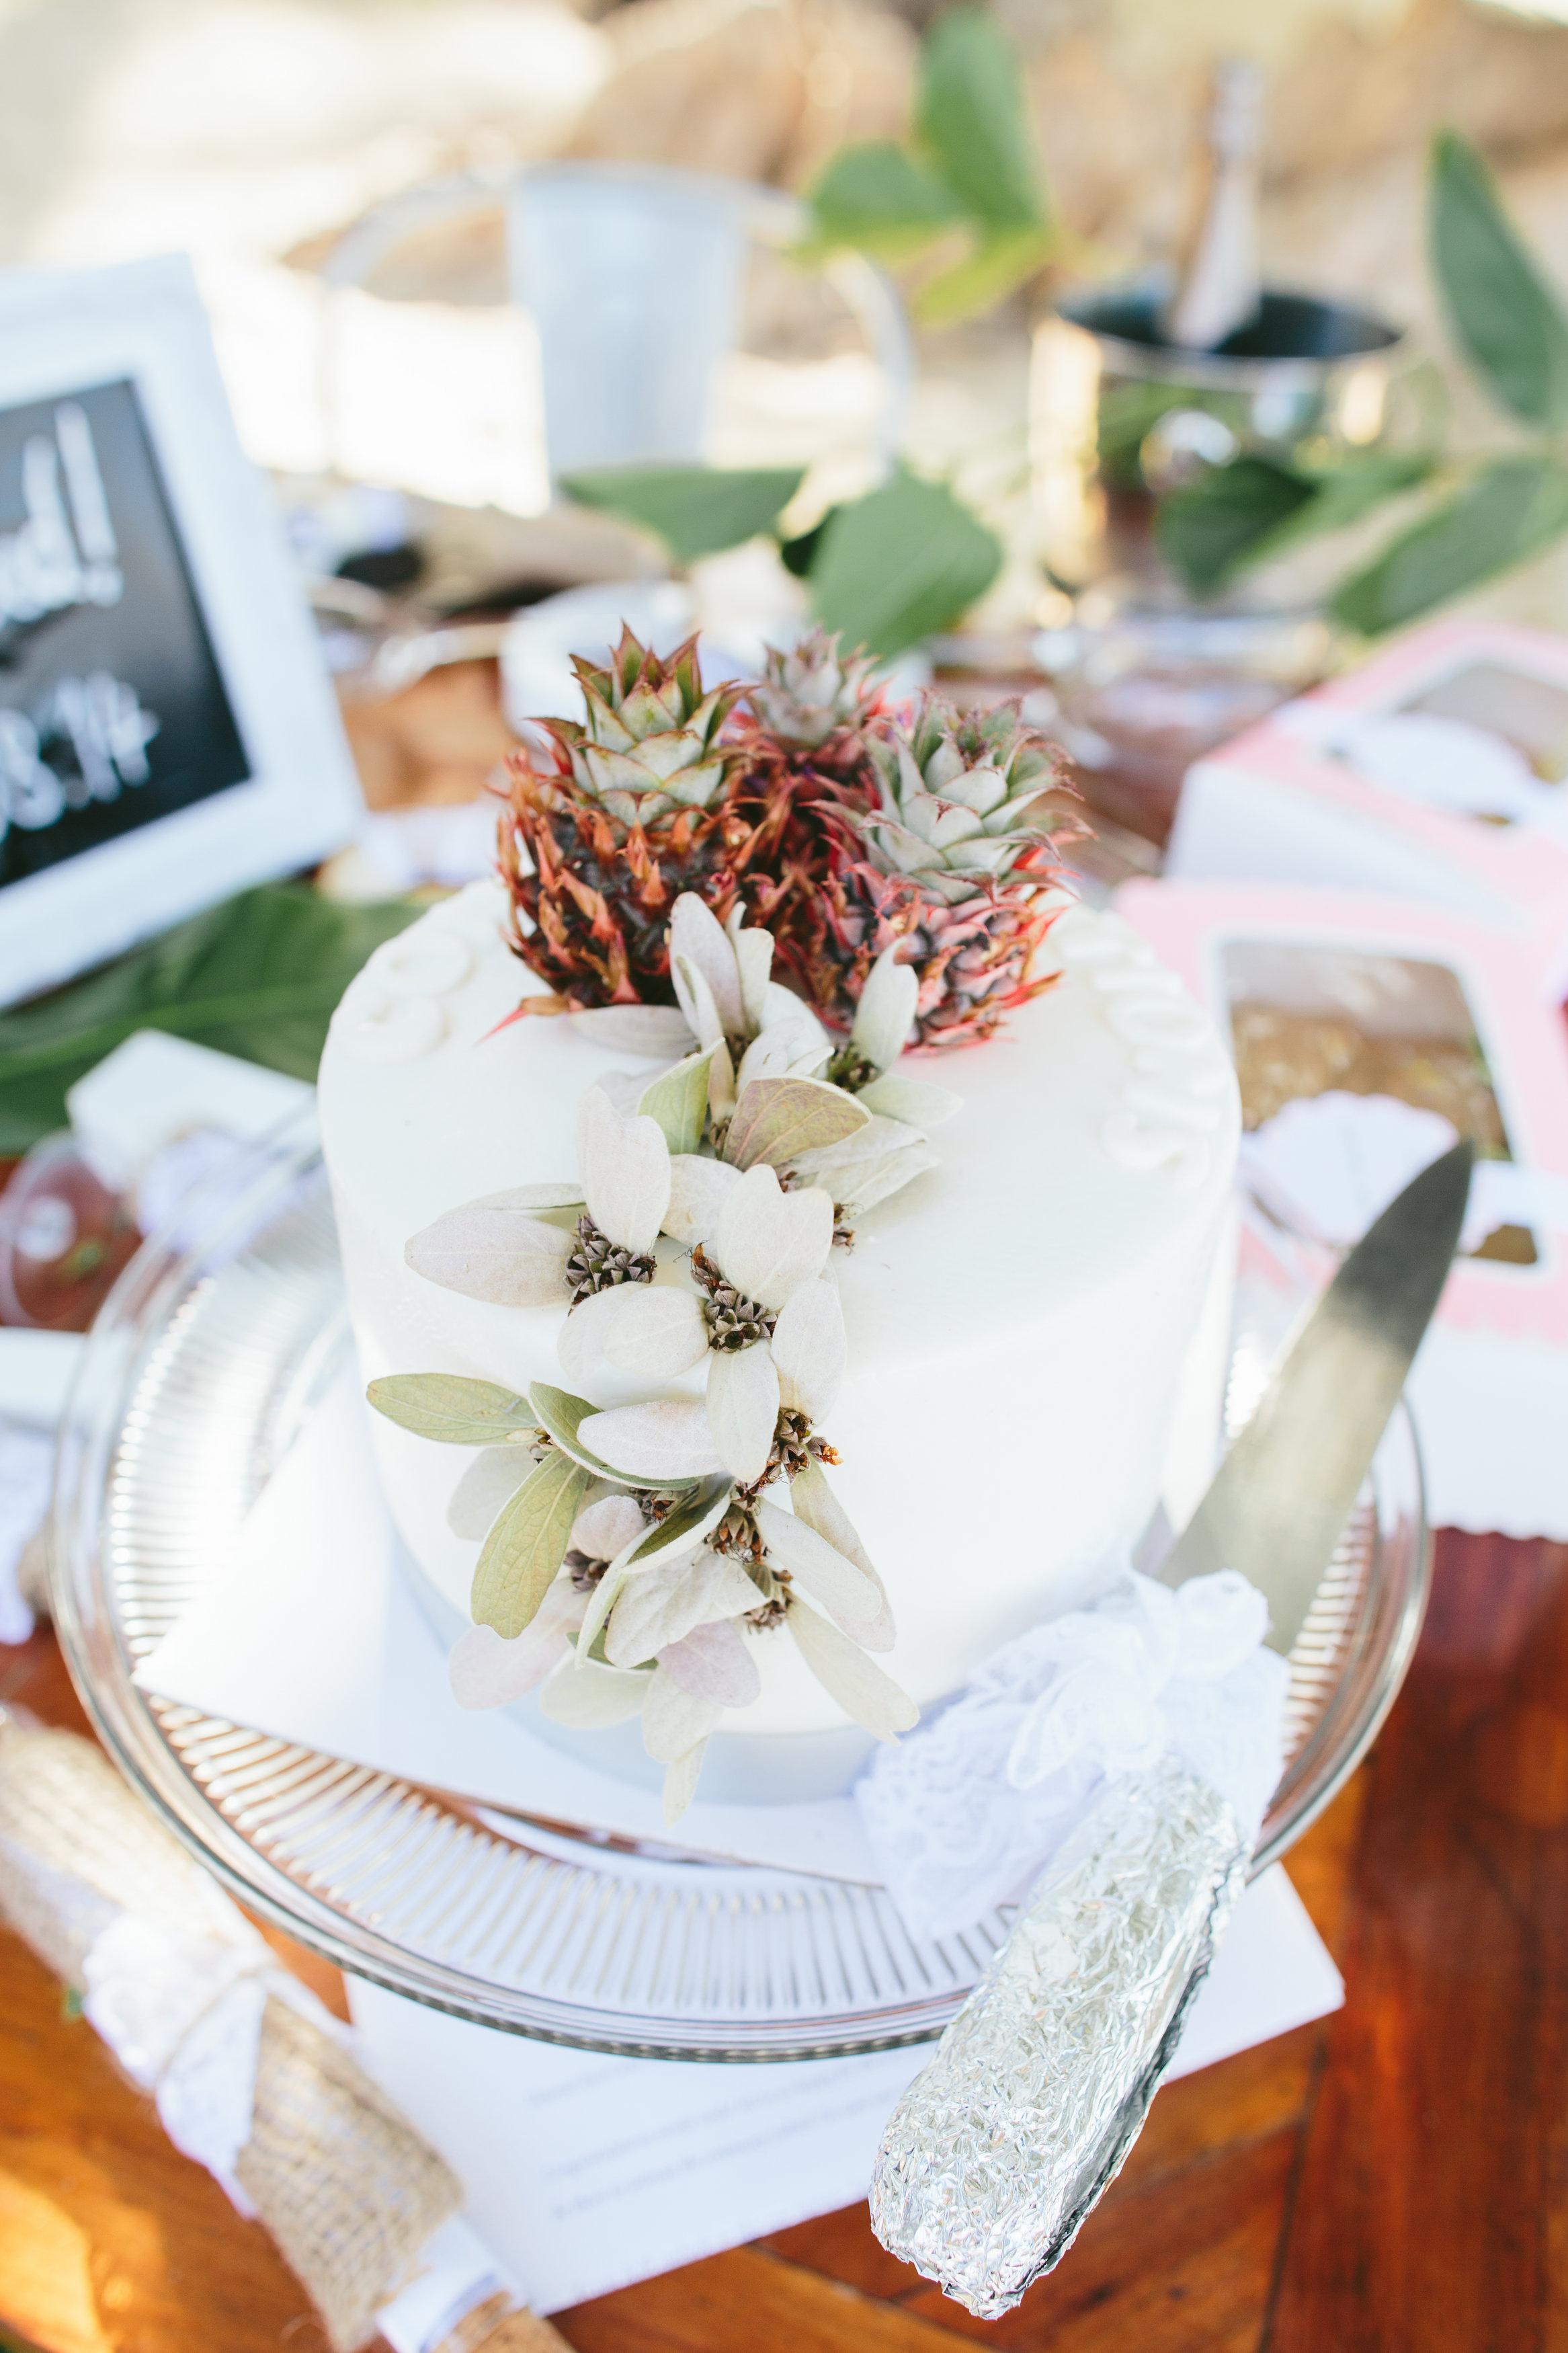 Fiji Wedding Cake - Fiji Wedding Elopement - The Remote Resort Fiji Islands